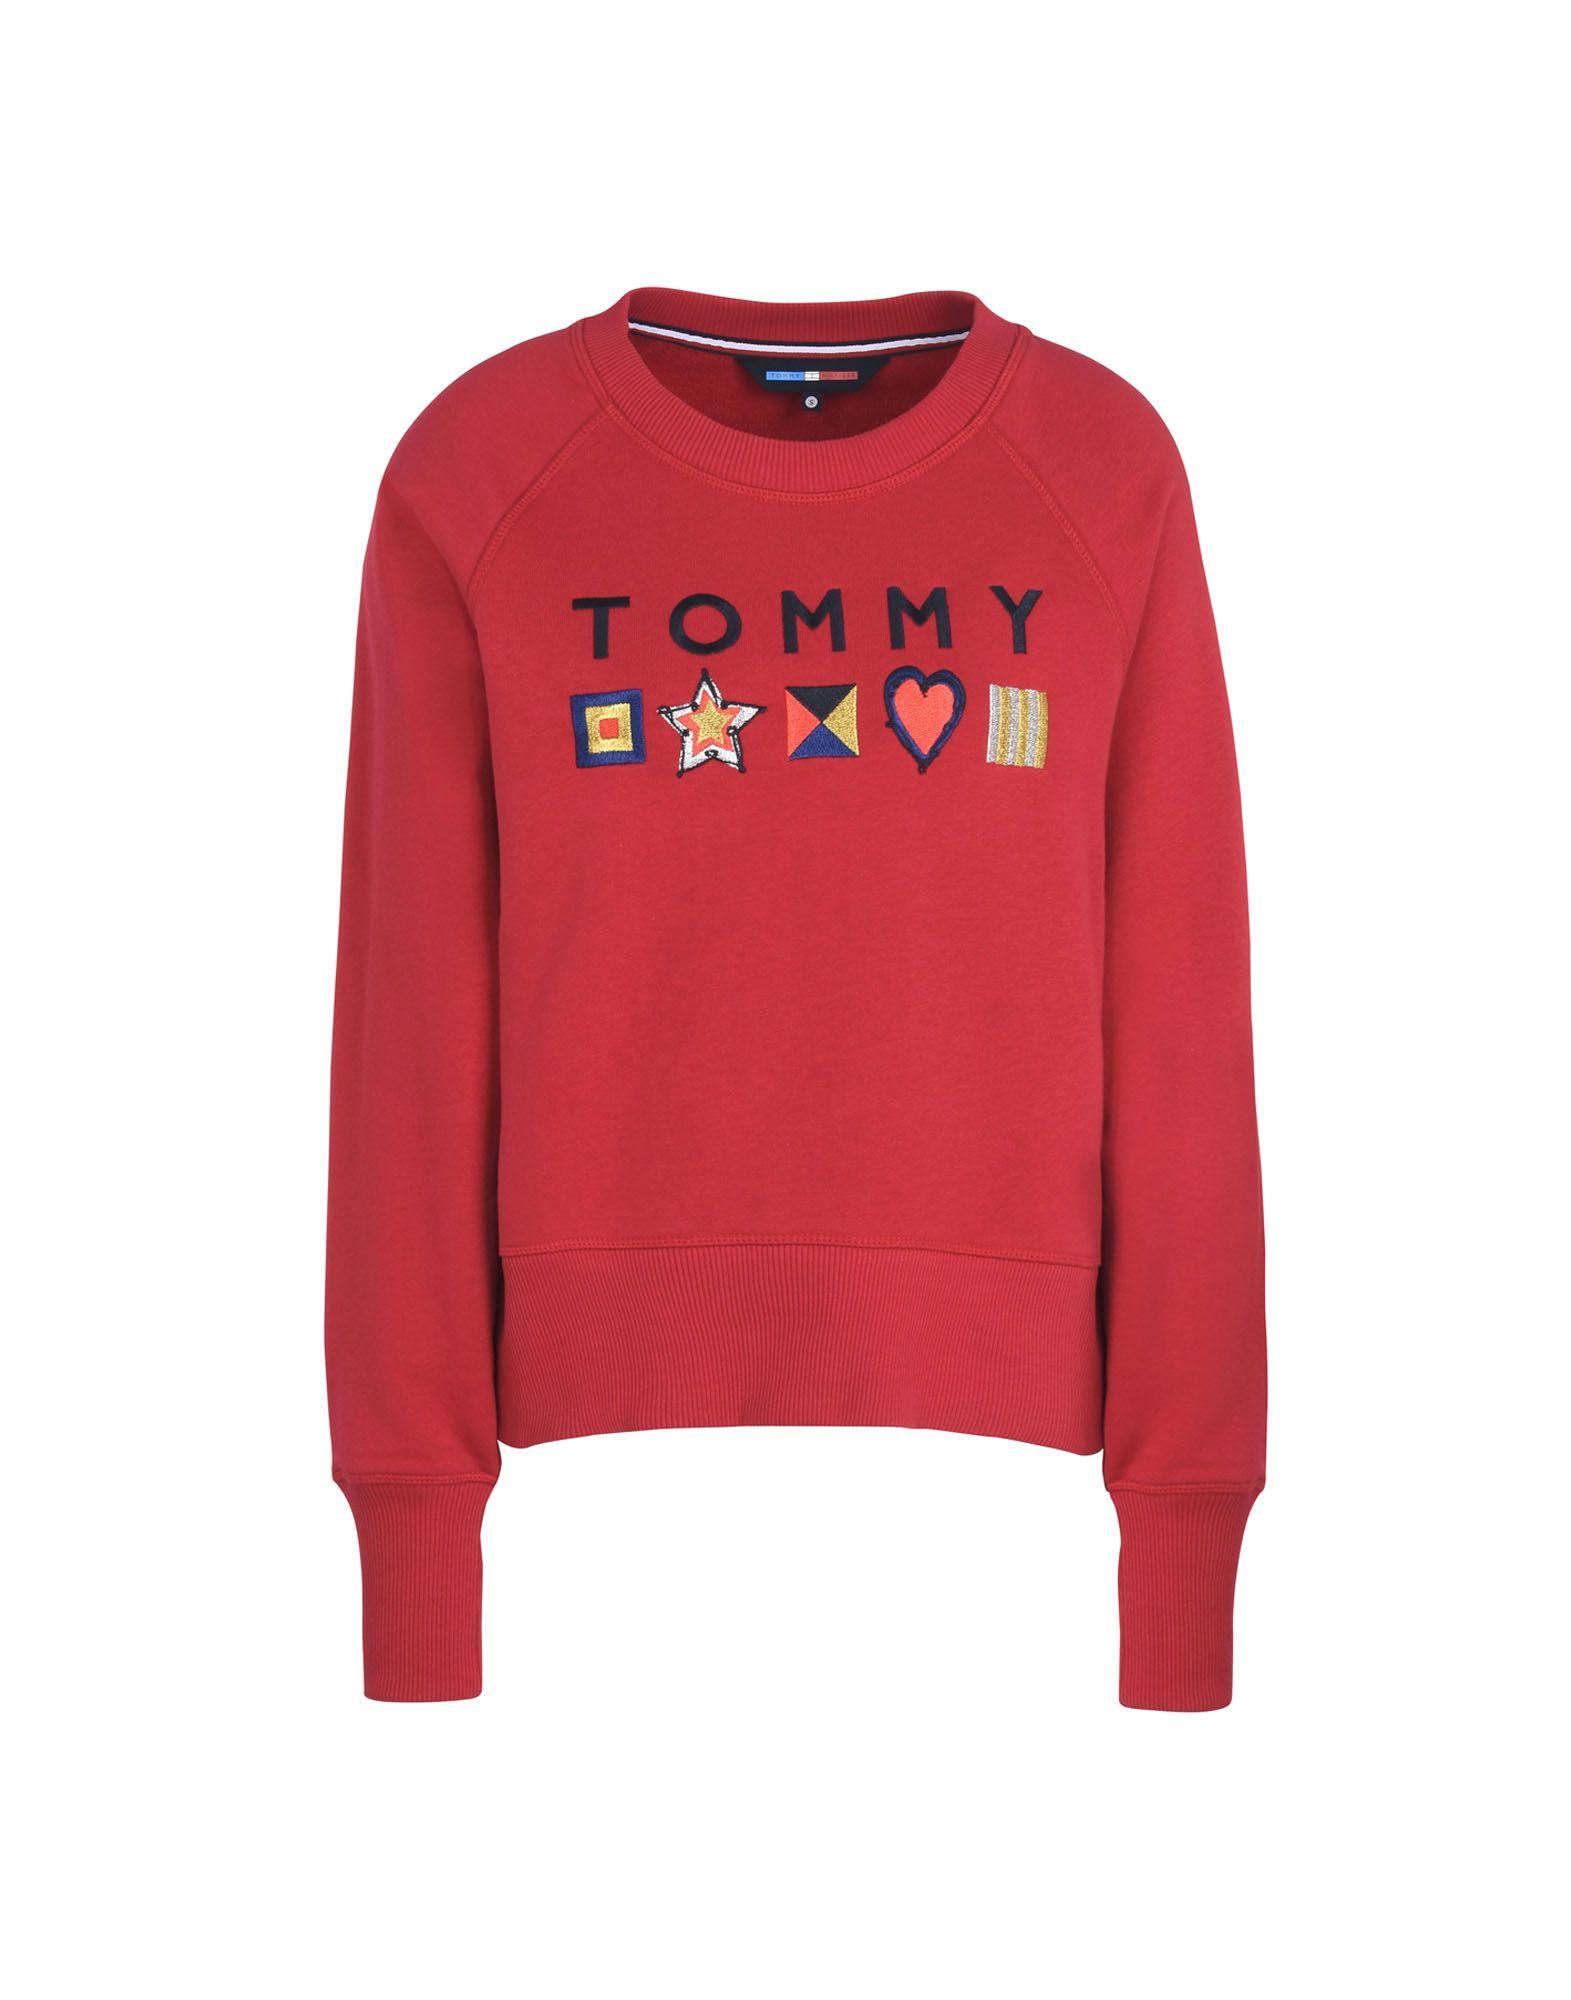 TOMMY HILFIGER Толстовка толстовка tommy hilfiger mw0mw04089 403 sky captain